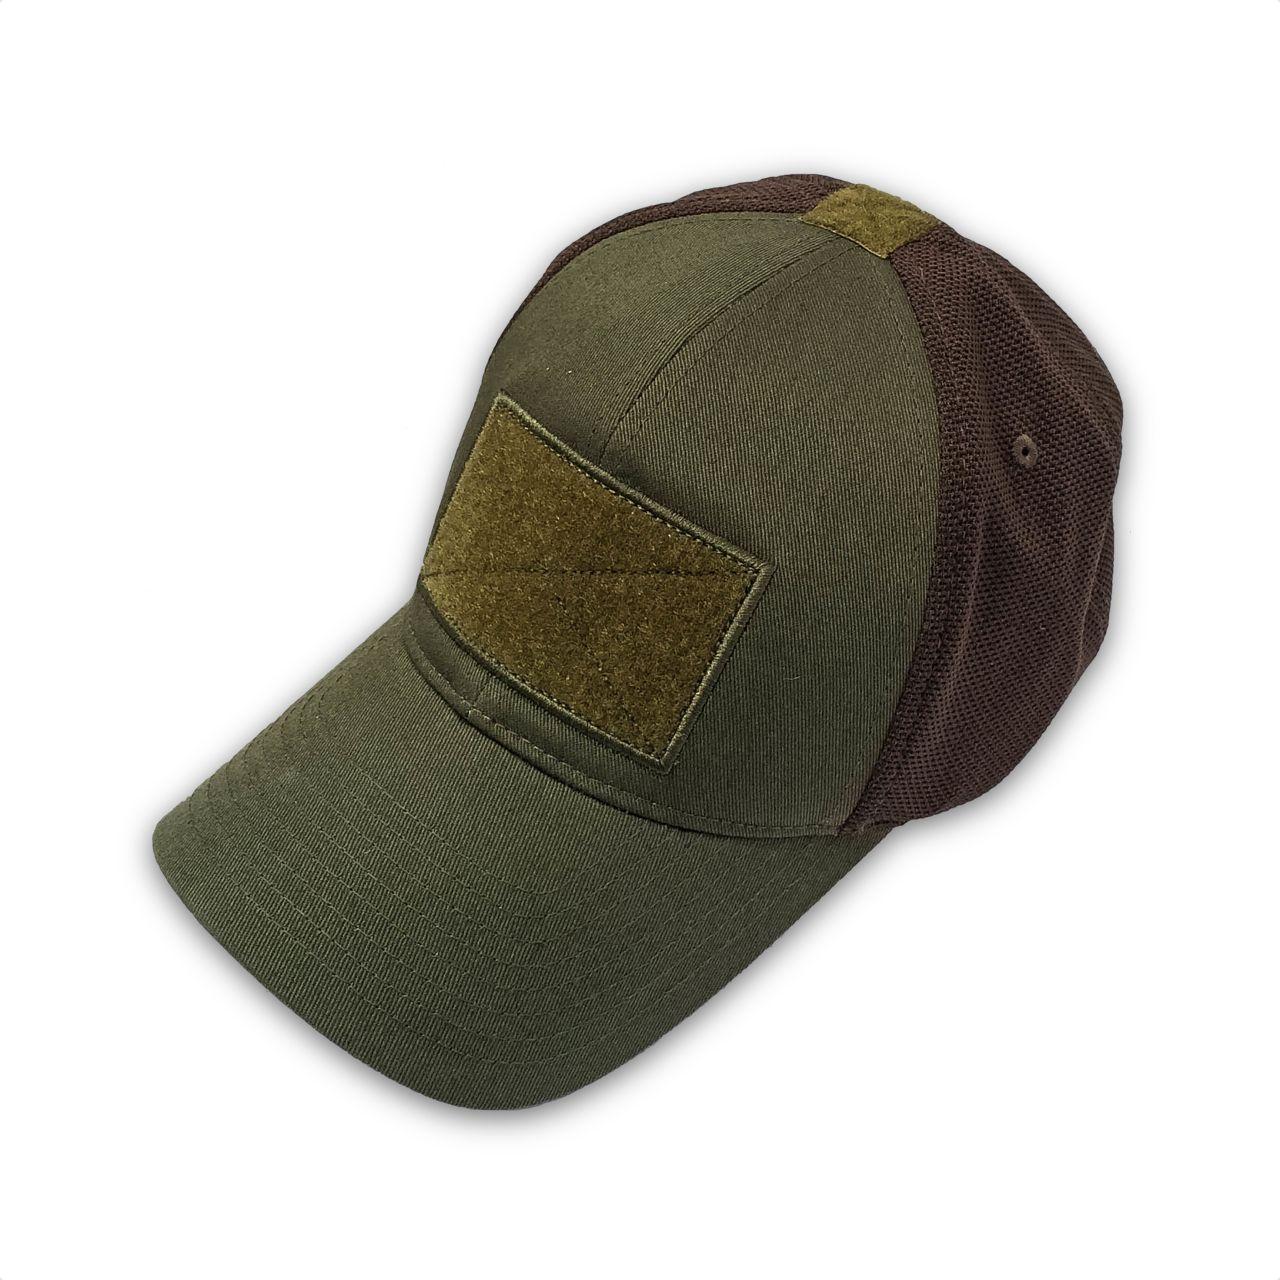 f49339f5f $29.95 Blasting Cap | Tactical Hats, multicam tactical hat, fitted ...